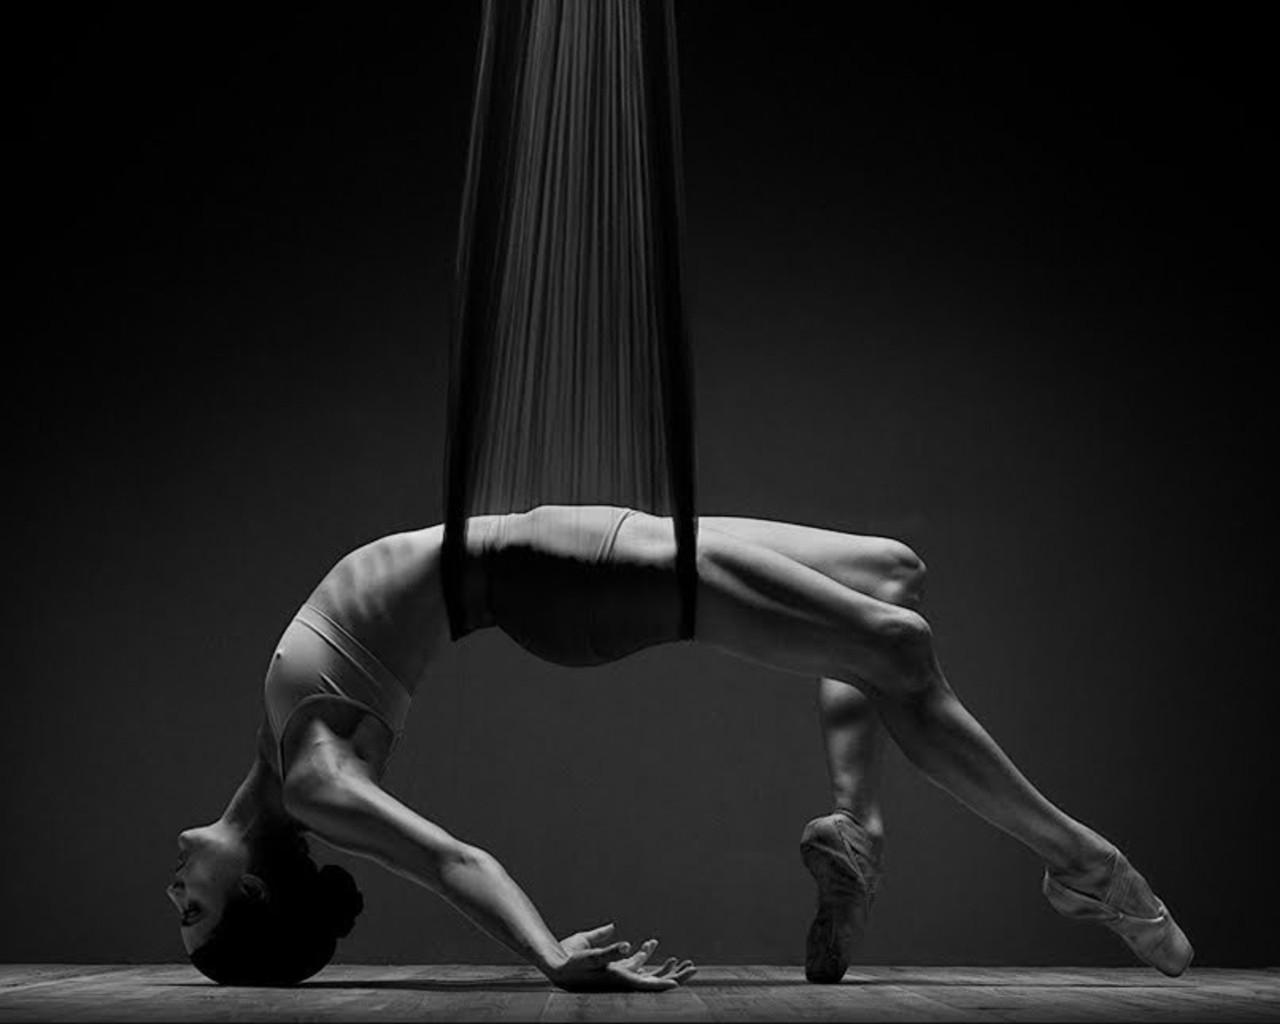 Ballet Desktop Wallpaper - WallpaperSafari